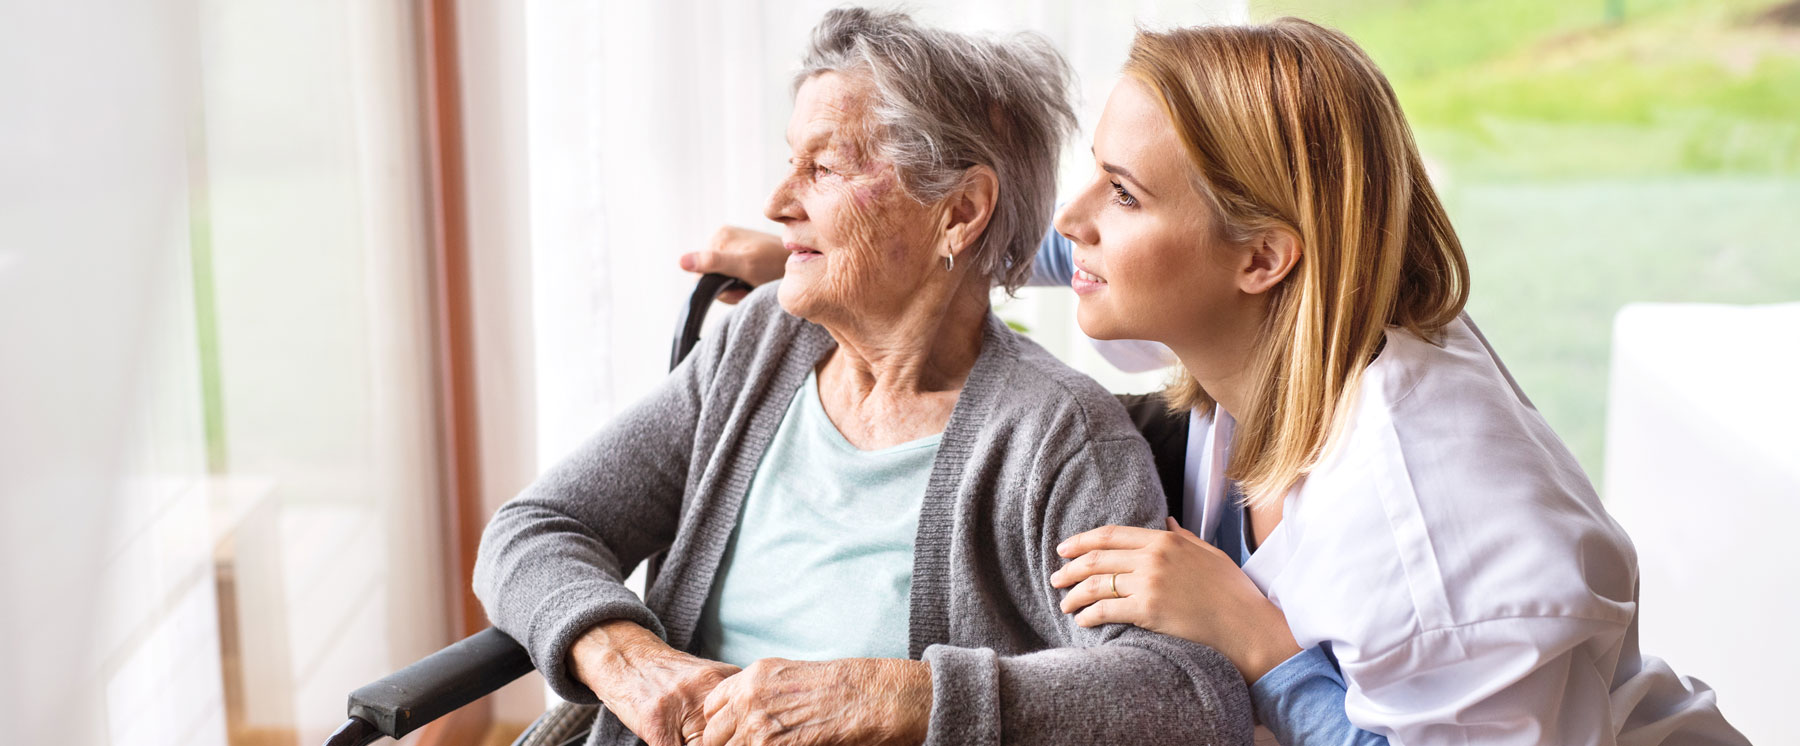 pflegedienst seniorin